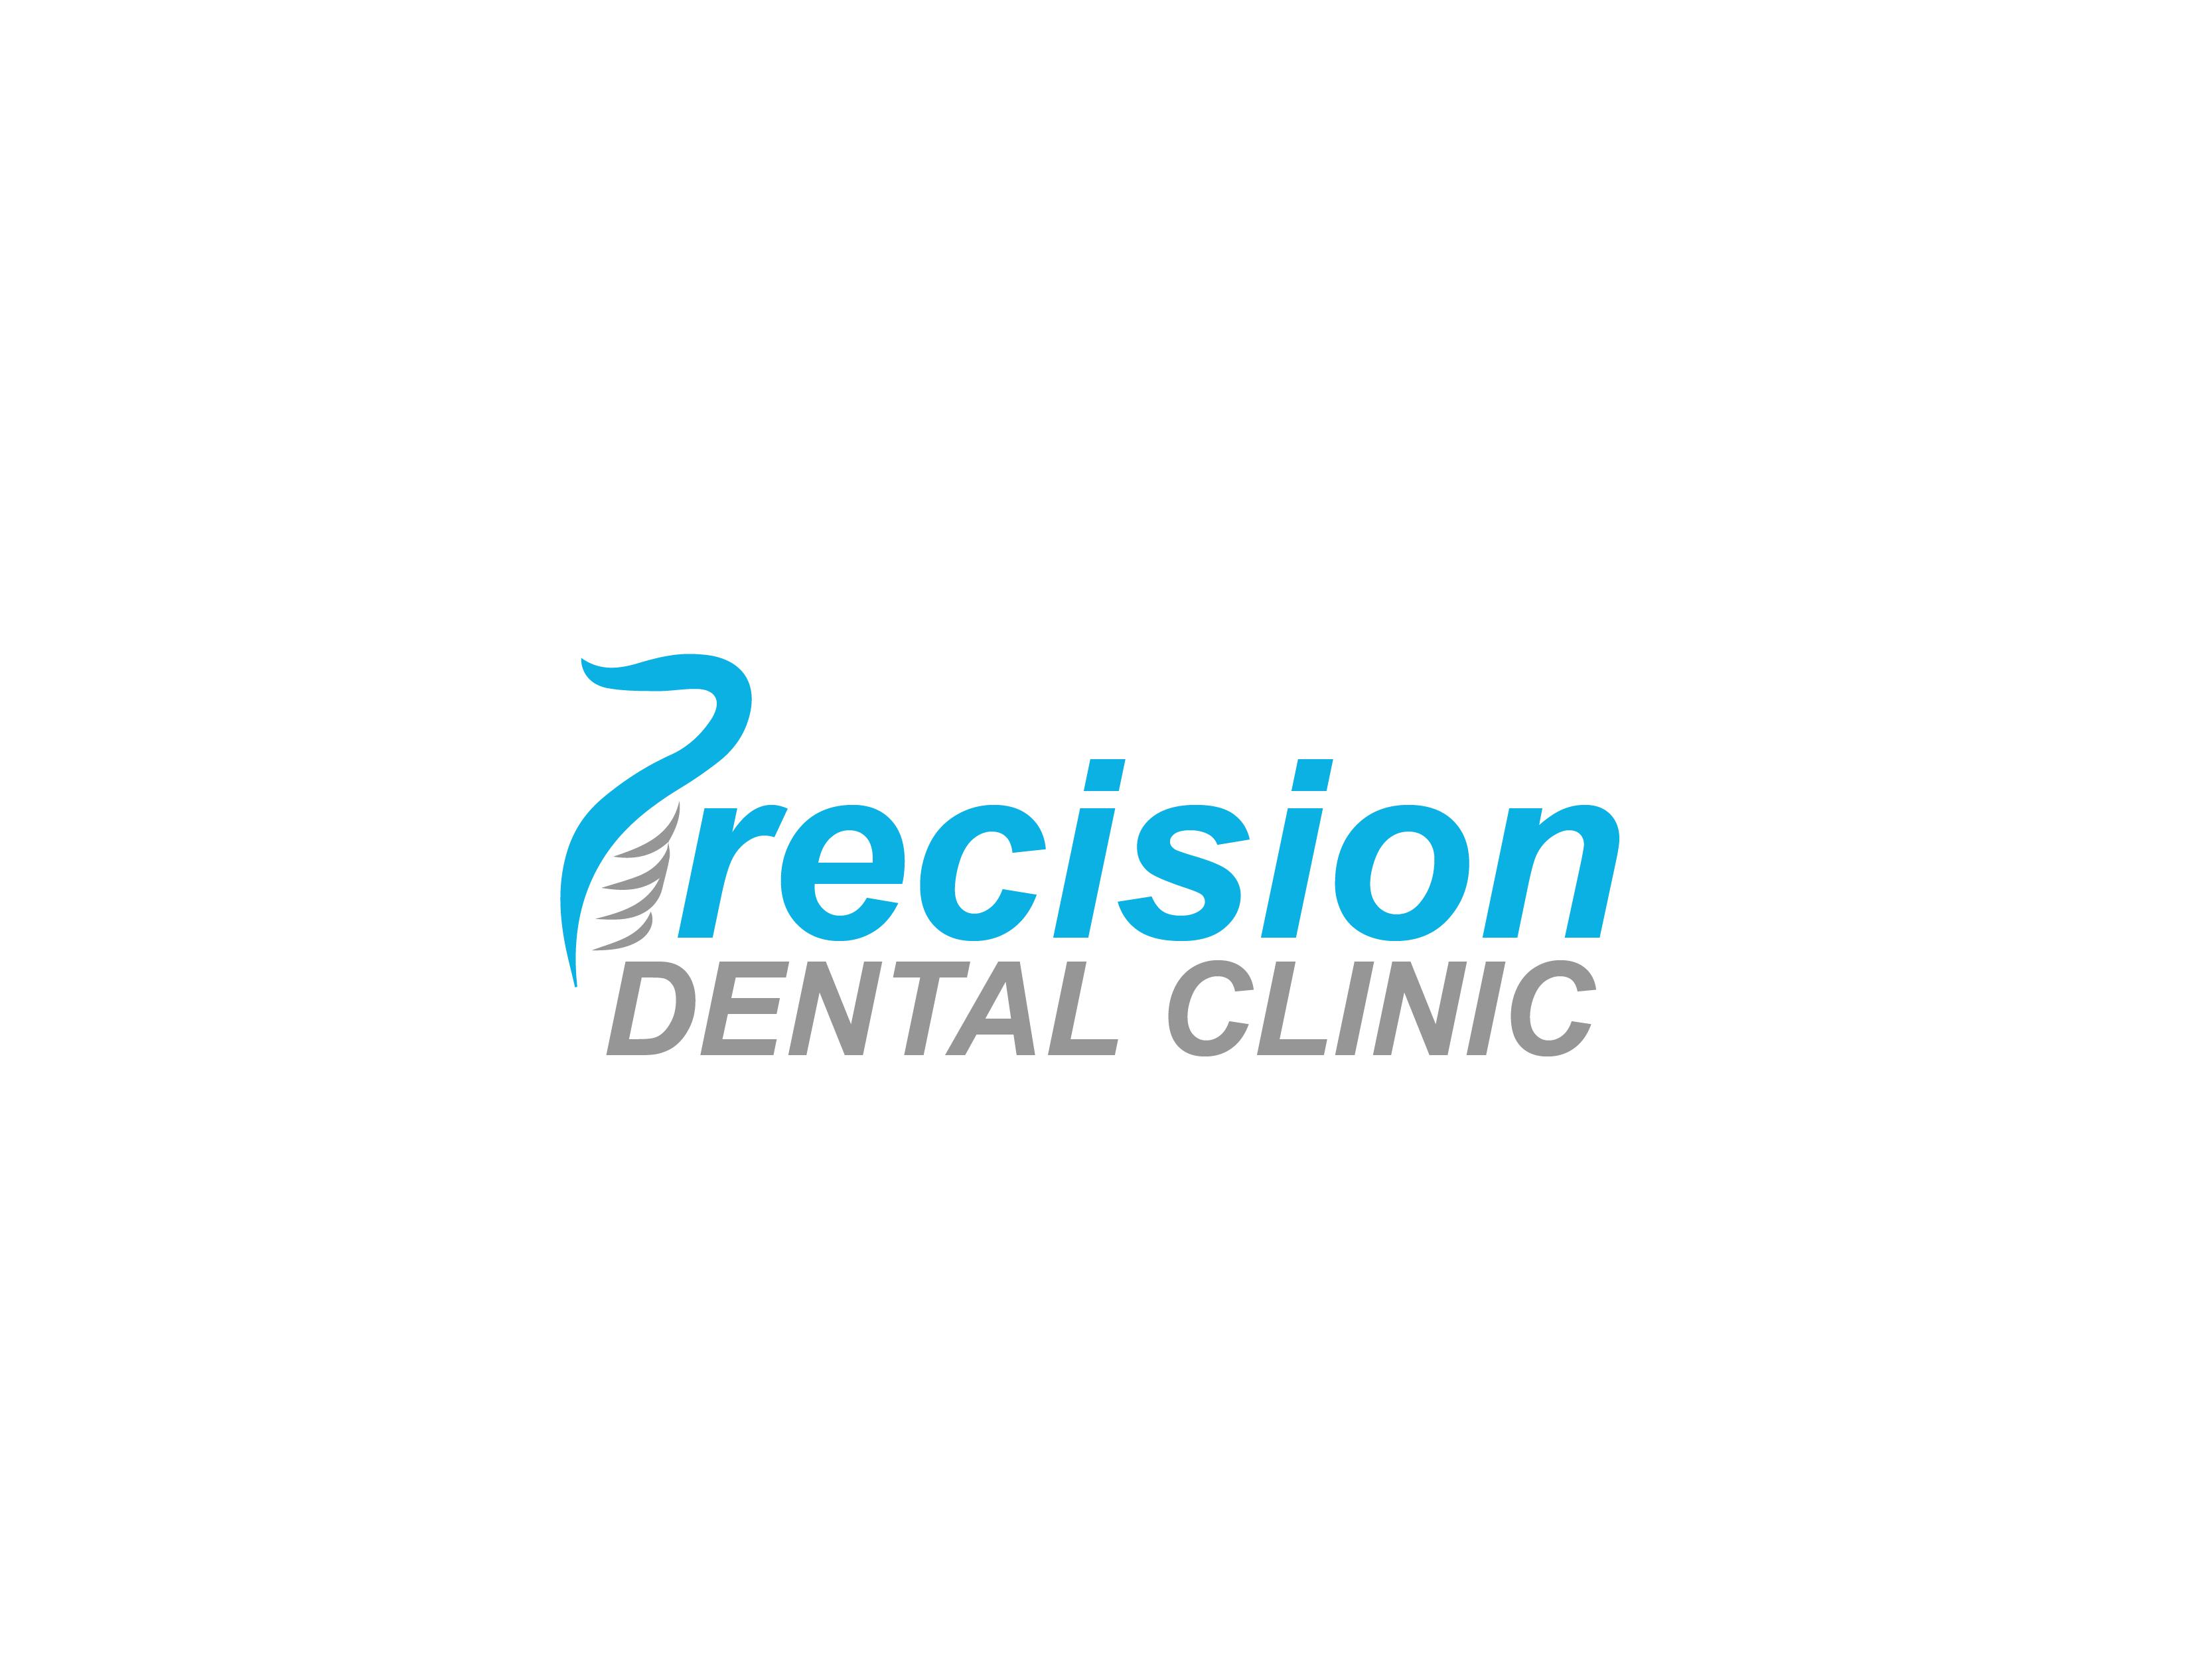 Logo Design by Private User - Entry No. 176 in the Logo Design Contest Captivating Logo Design for Precision Dental Clinic.